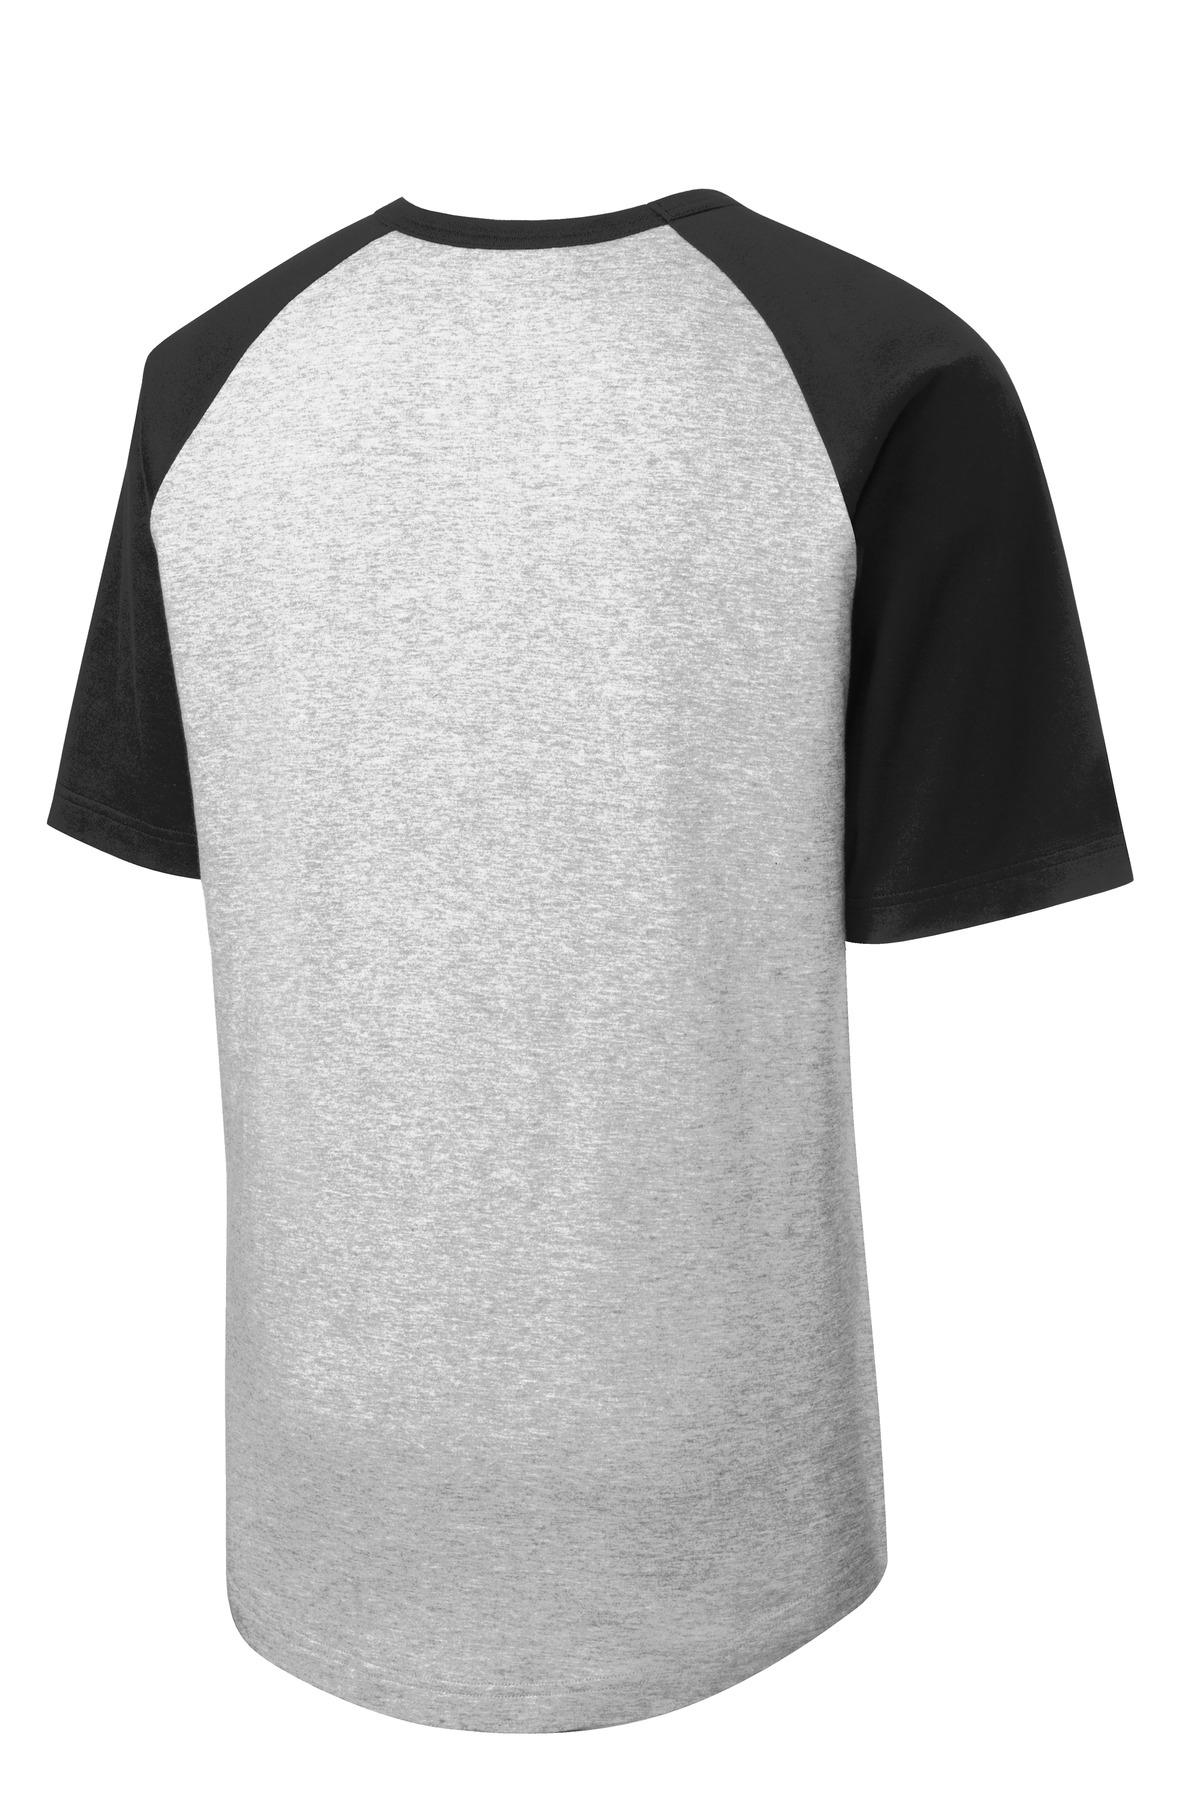 Sport-Tek Youth Short Sleeve Colorblock Raglan Jersey YT201